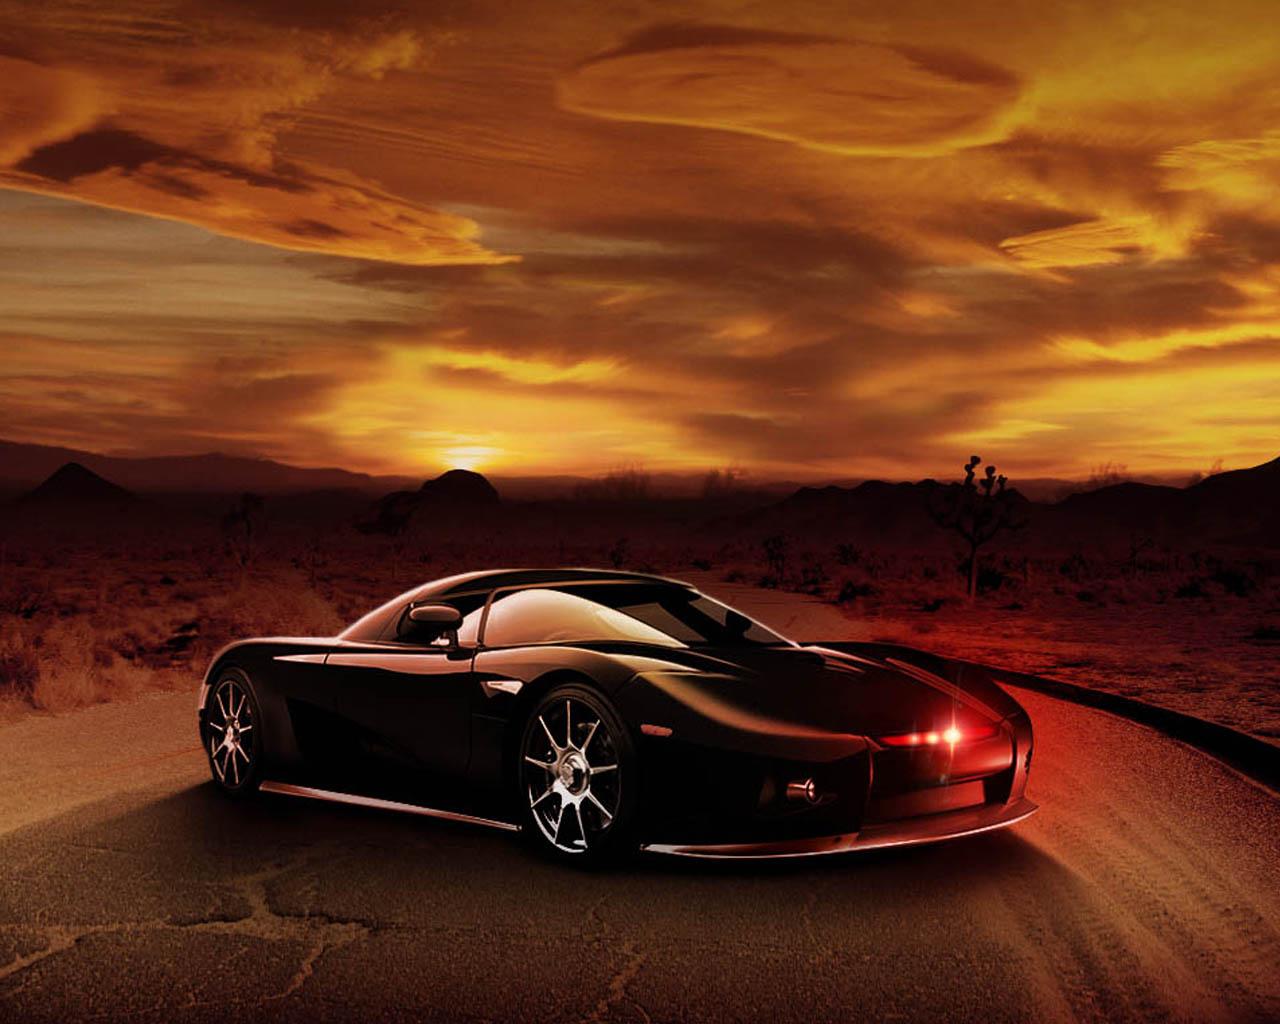 Knight Rider Car 1280x1024